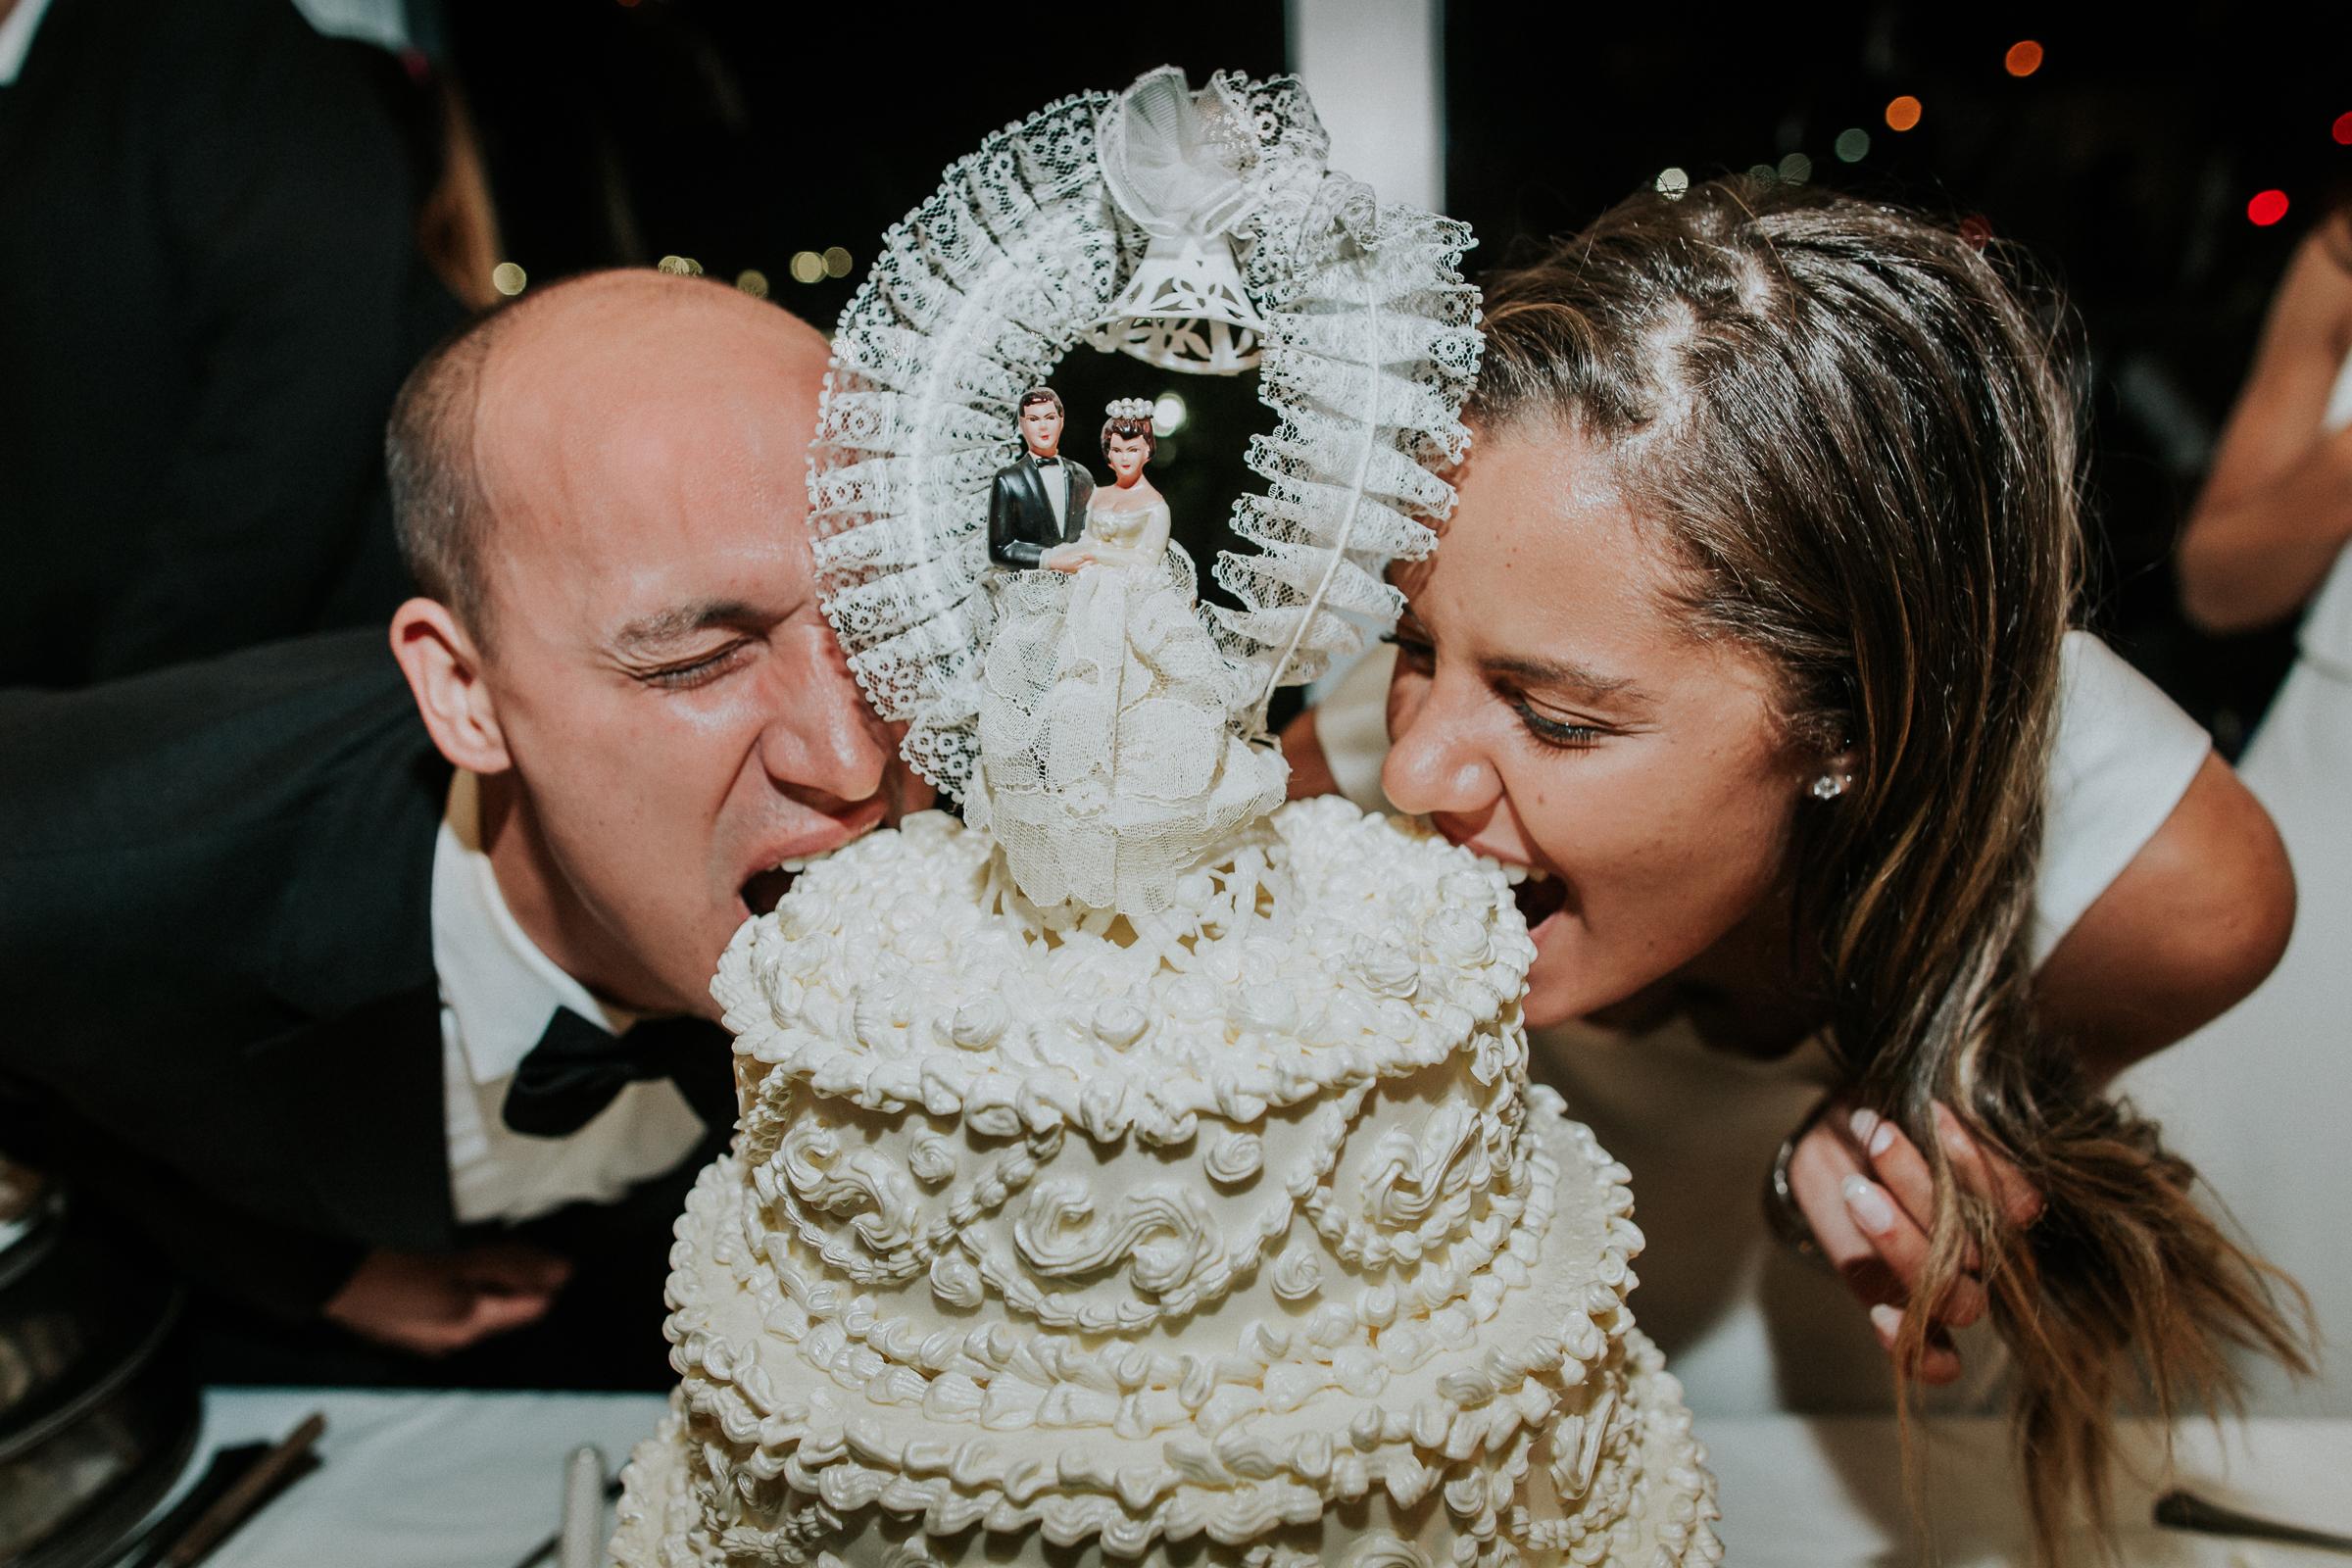 New-York-Documentary-Wedding-Photography-Best-Of-2017-by-Elvira-Kalviste-Photography-87.jpg